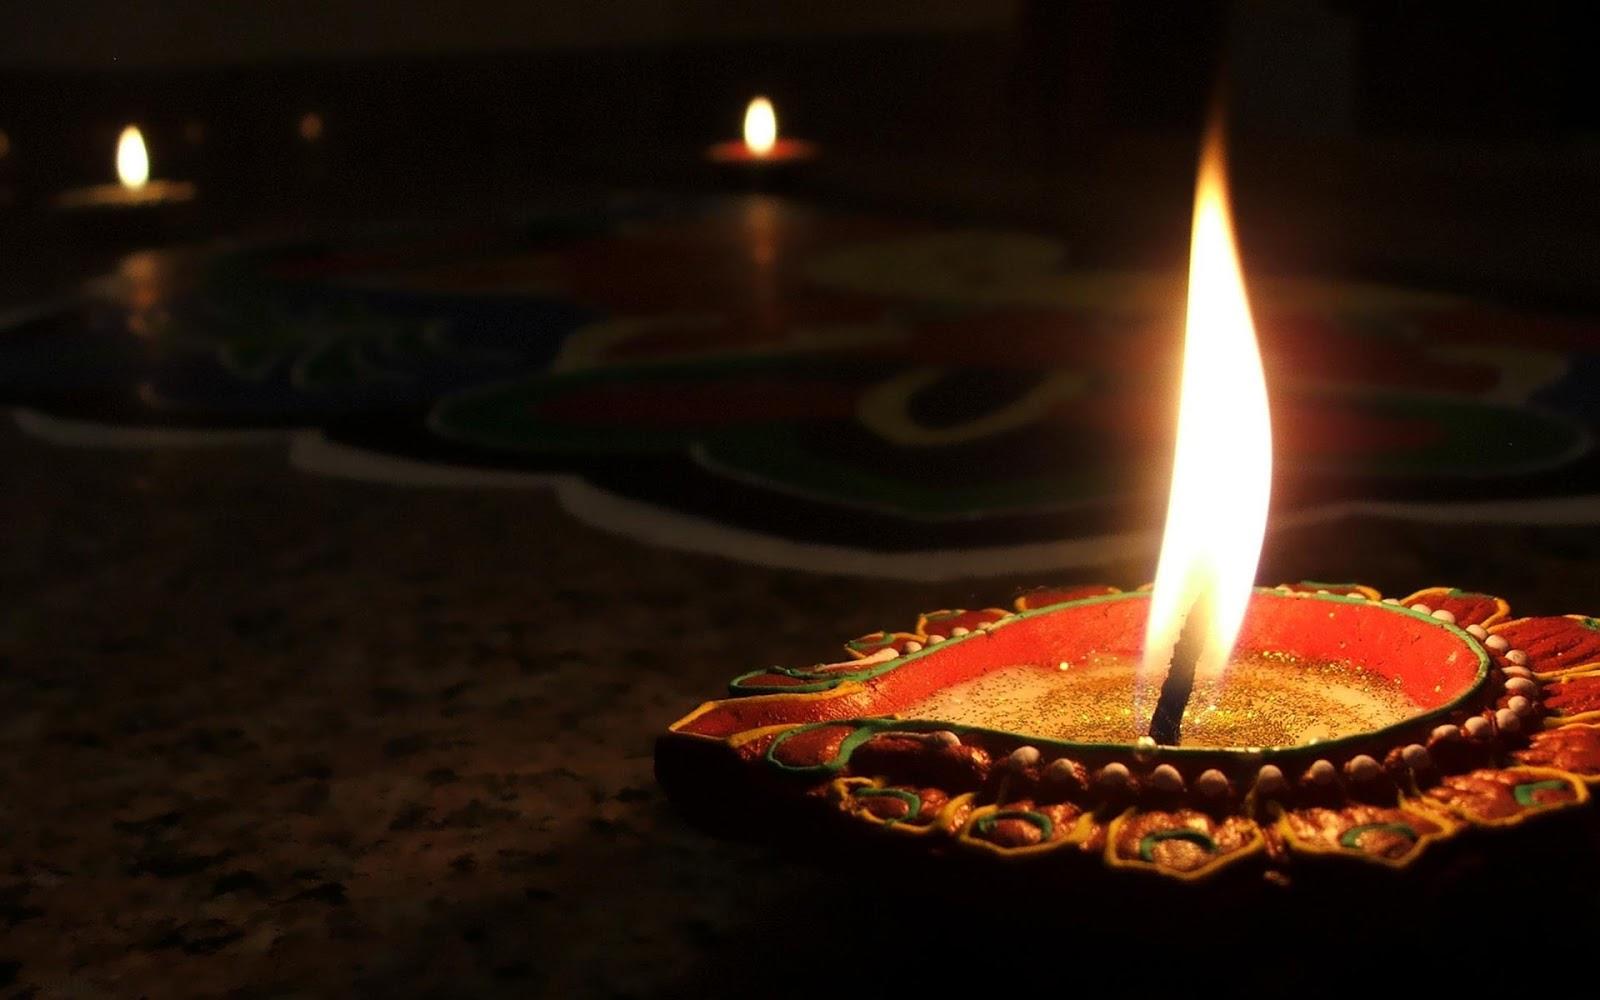 Diwali Diya Images, Pictures, Diwali Diya Clipart Pics & Wallpapers